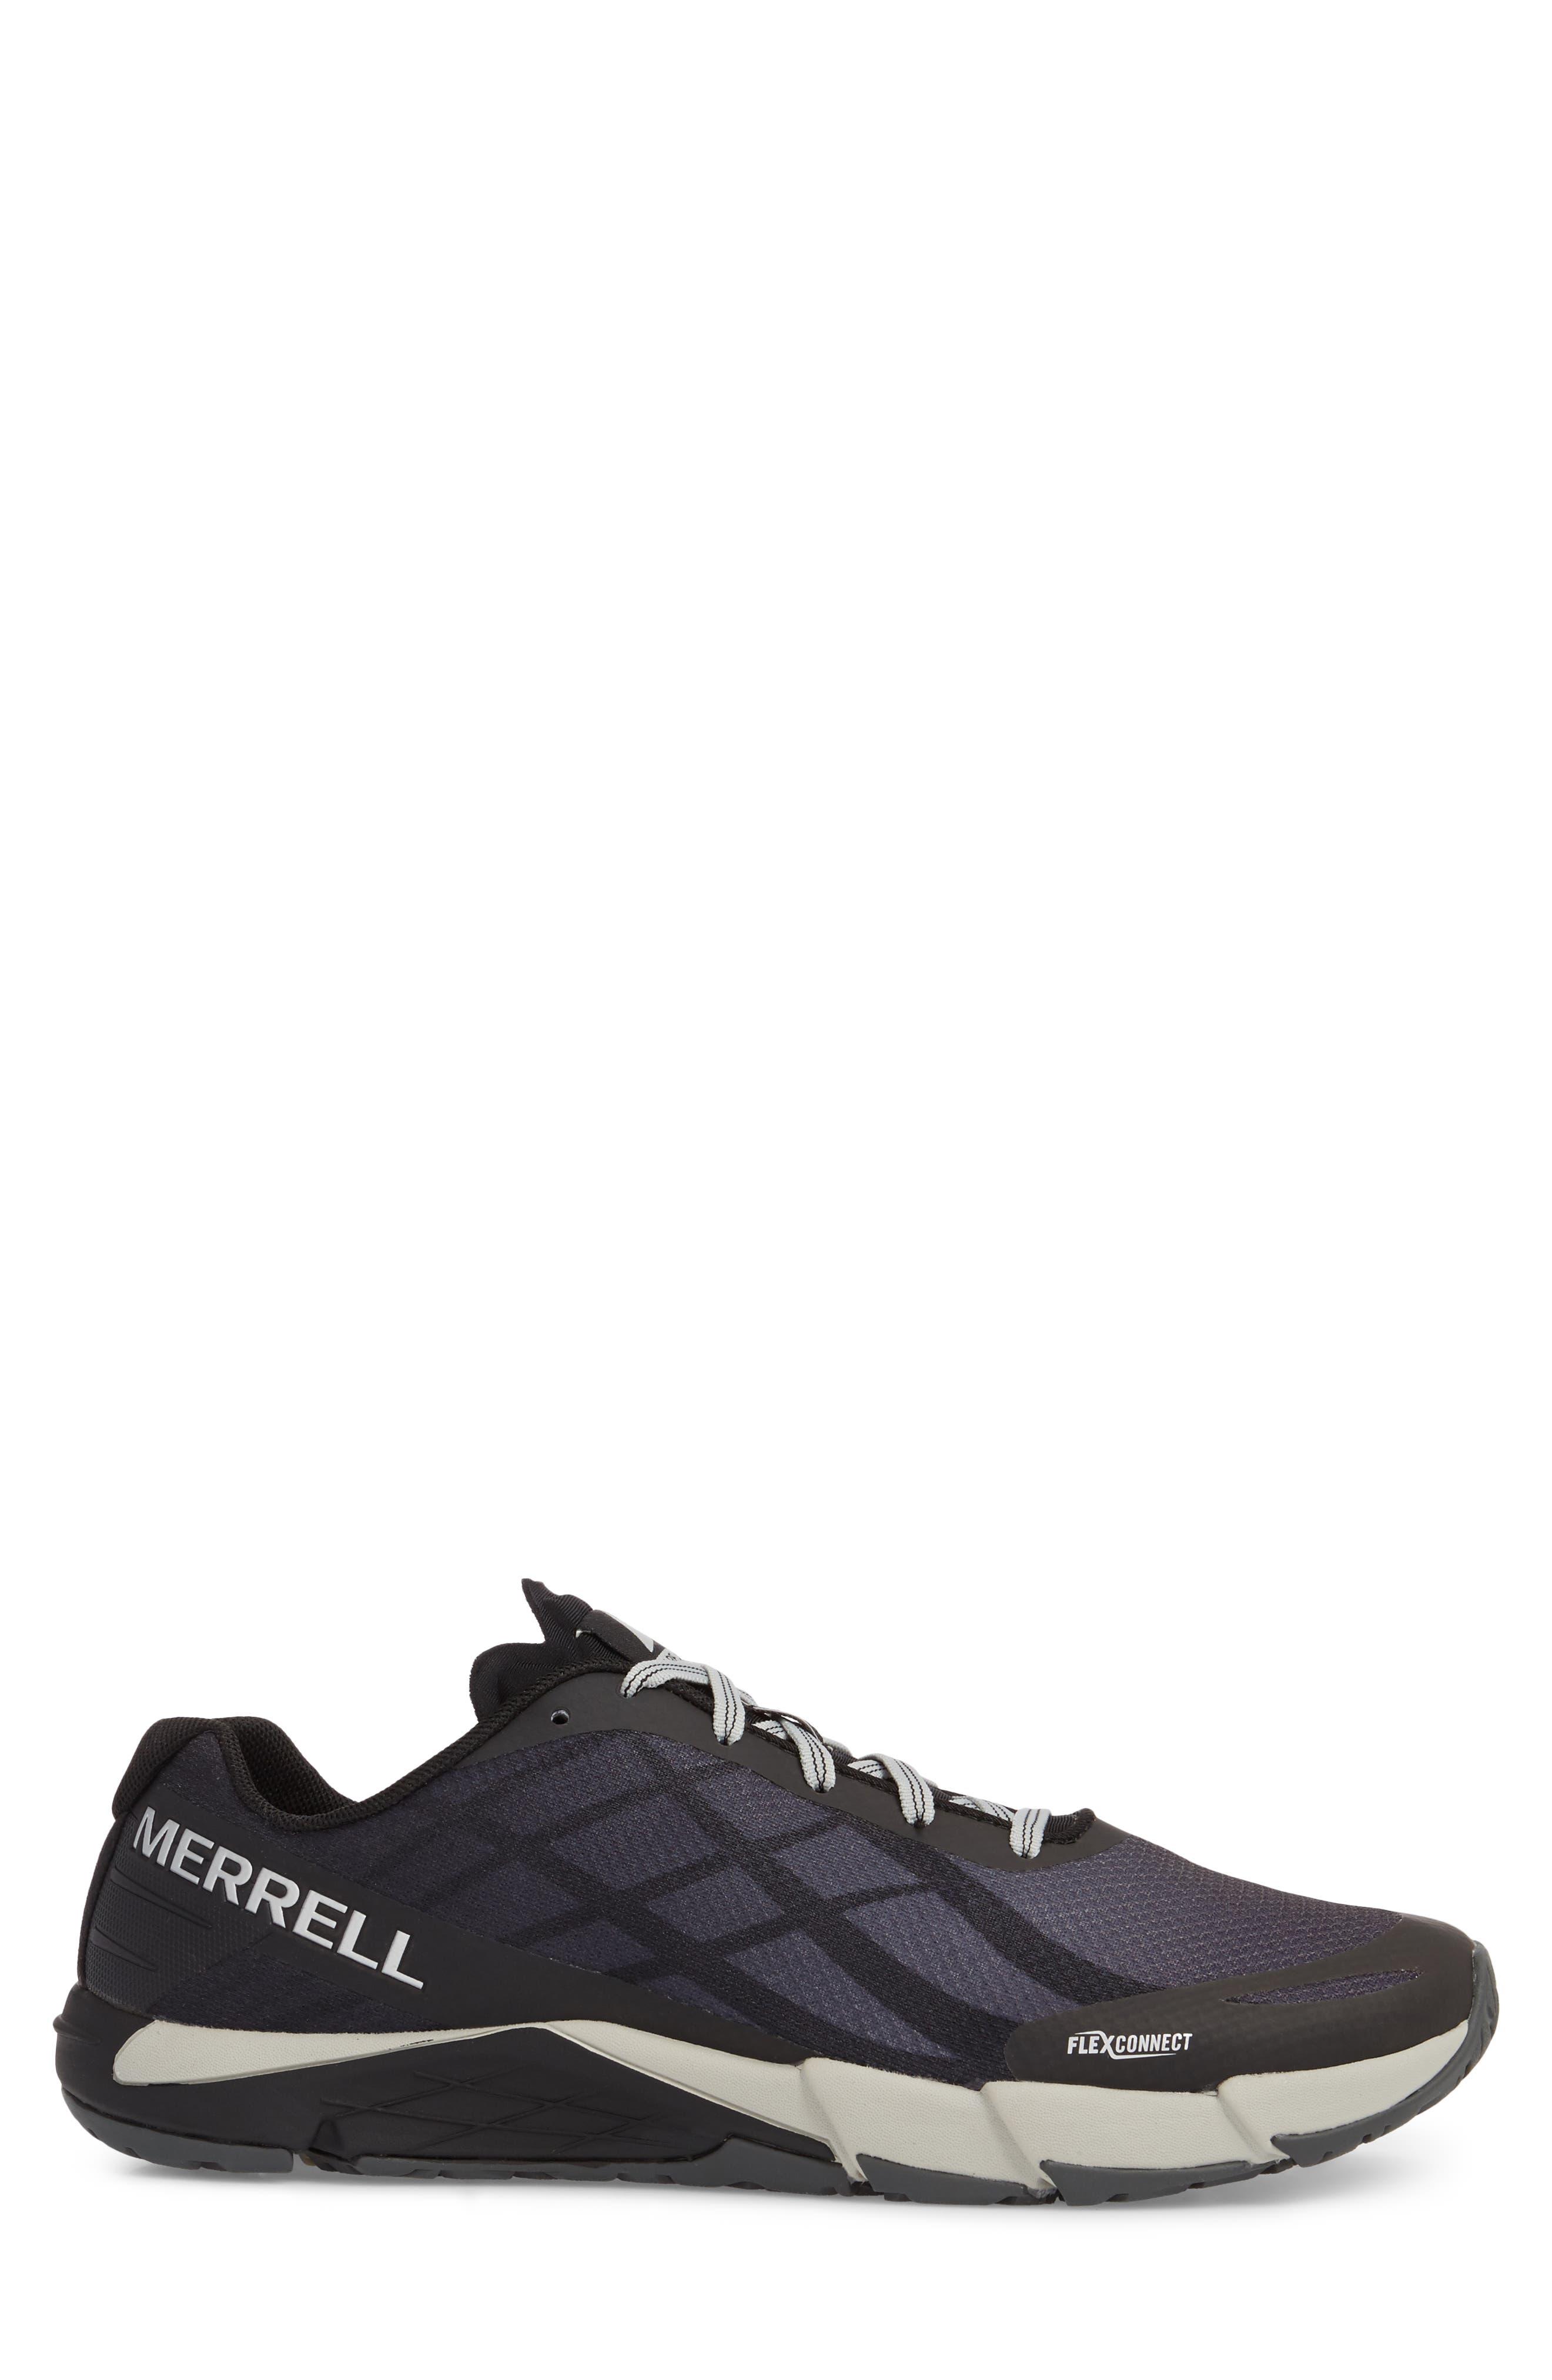 Bare Access Flex Running Shoe,                             Alternate thumbnail 3, color,                             Black/ Silver